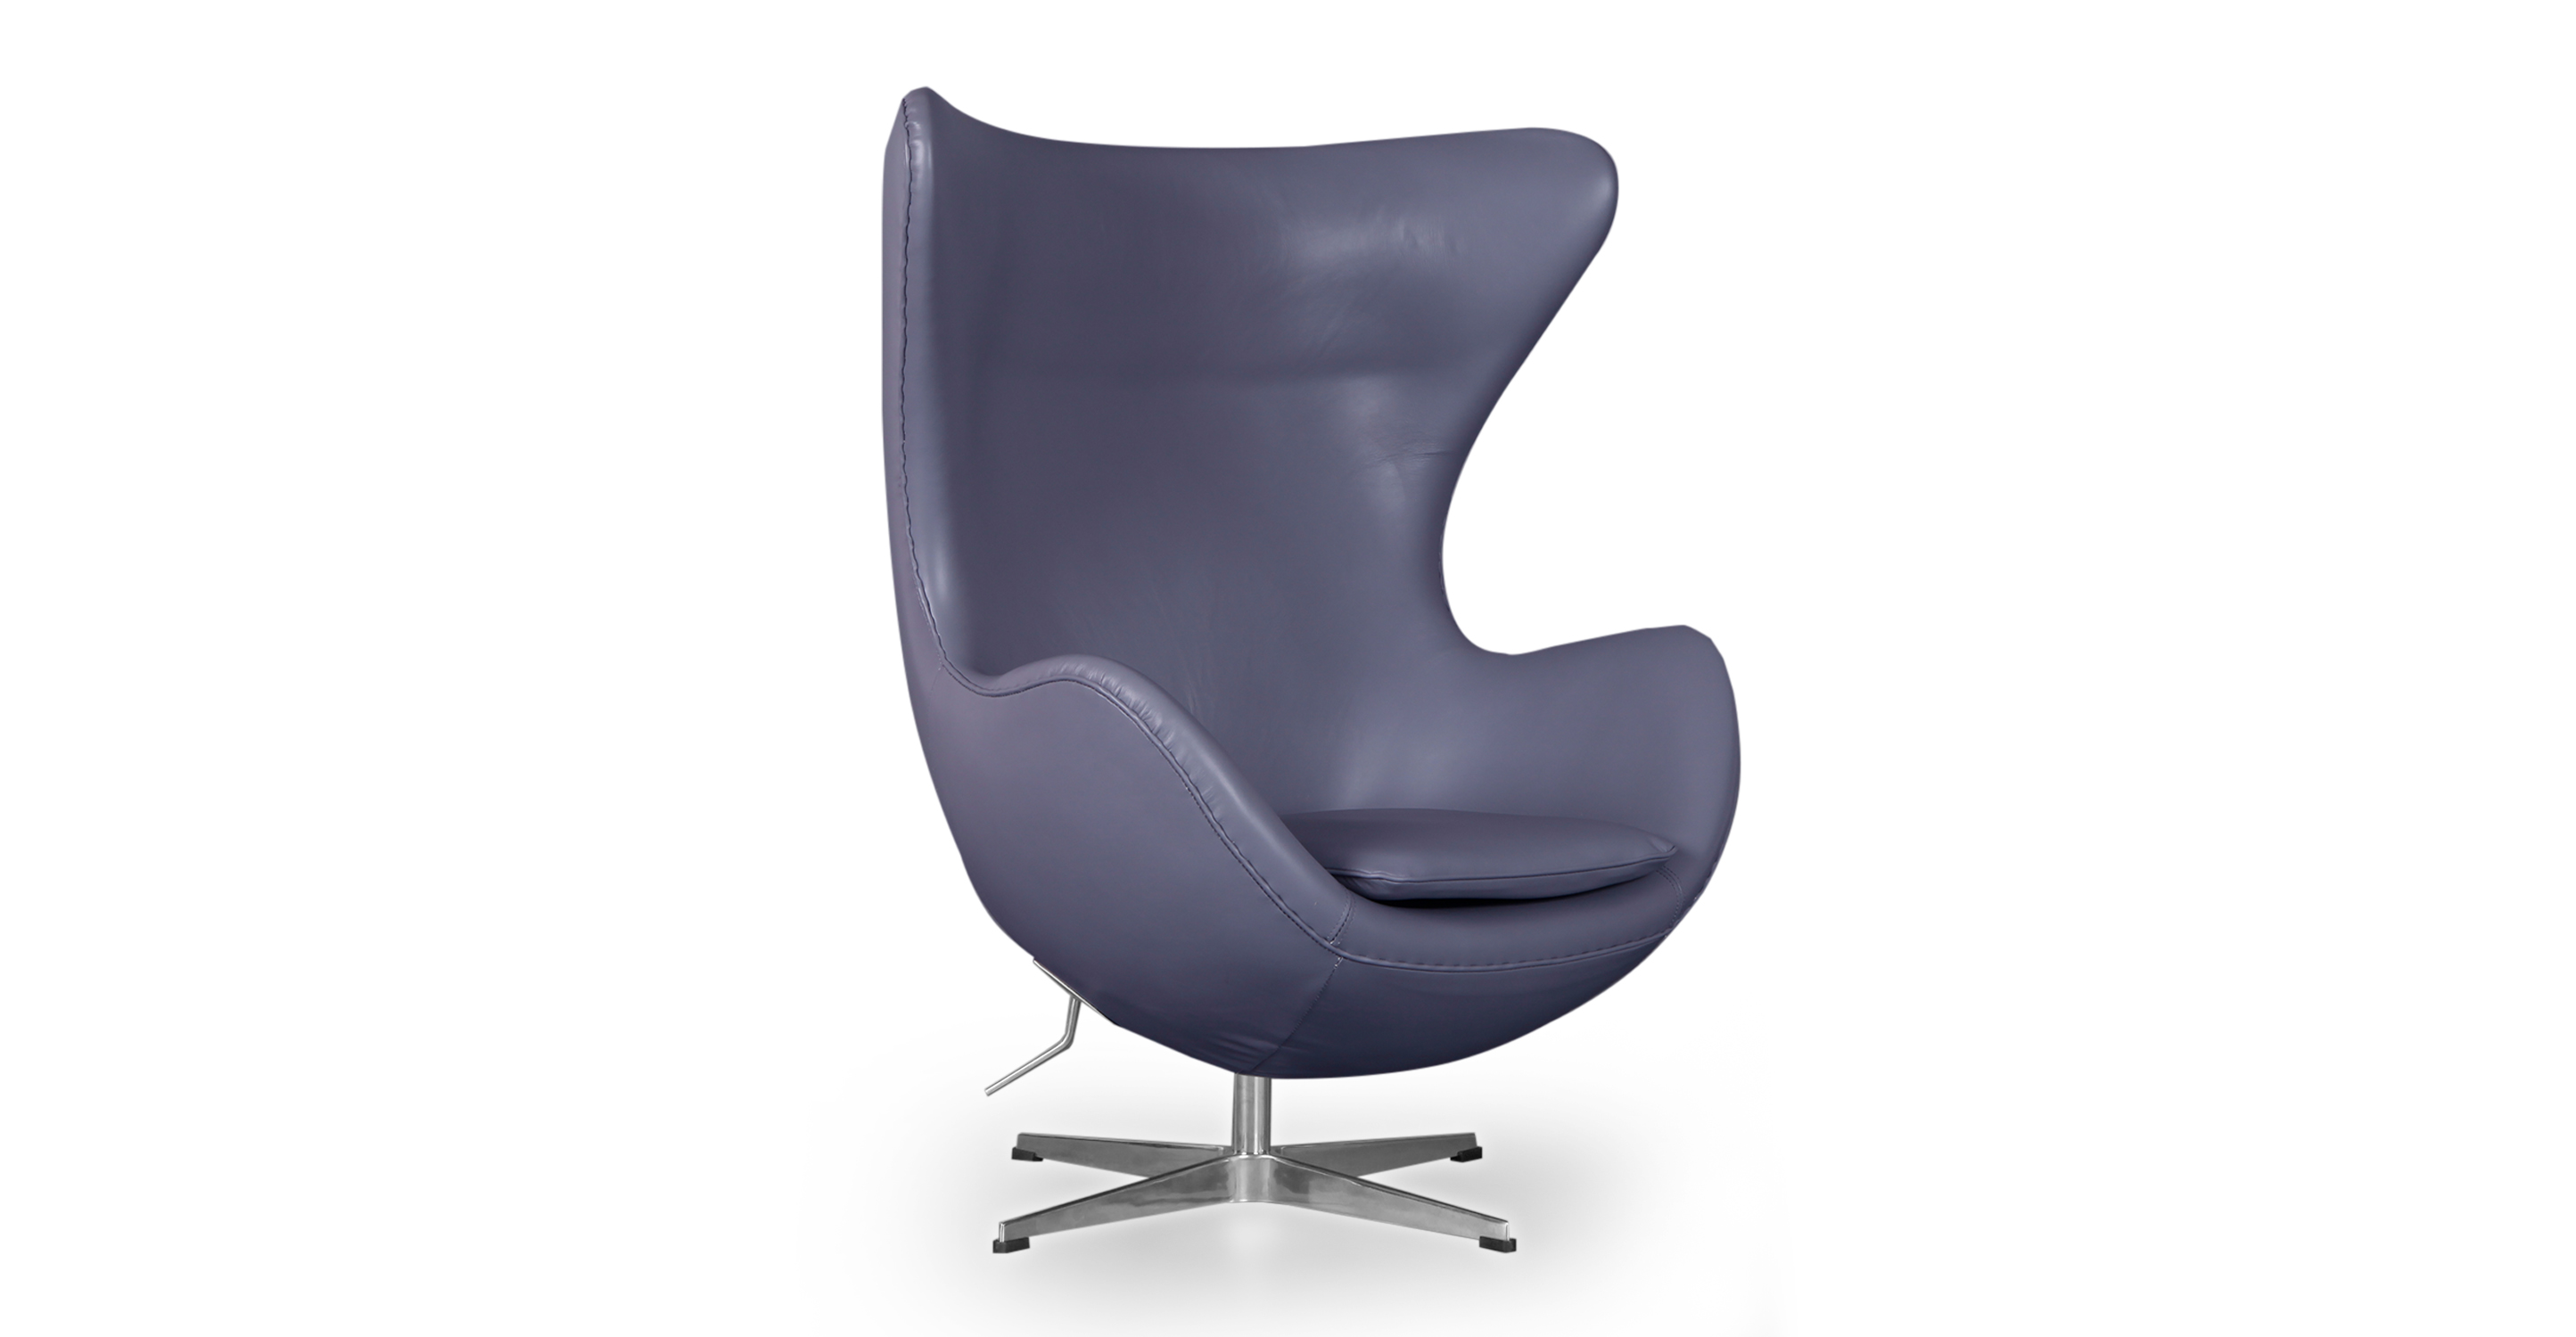 Amoeba Swivel Leather Chair & Ottoman, Seal Grey